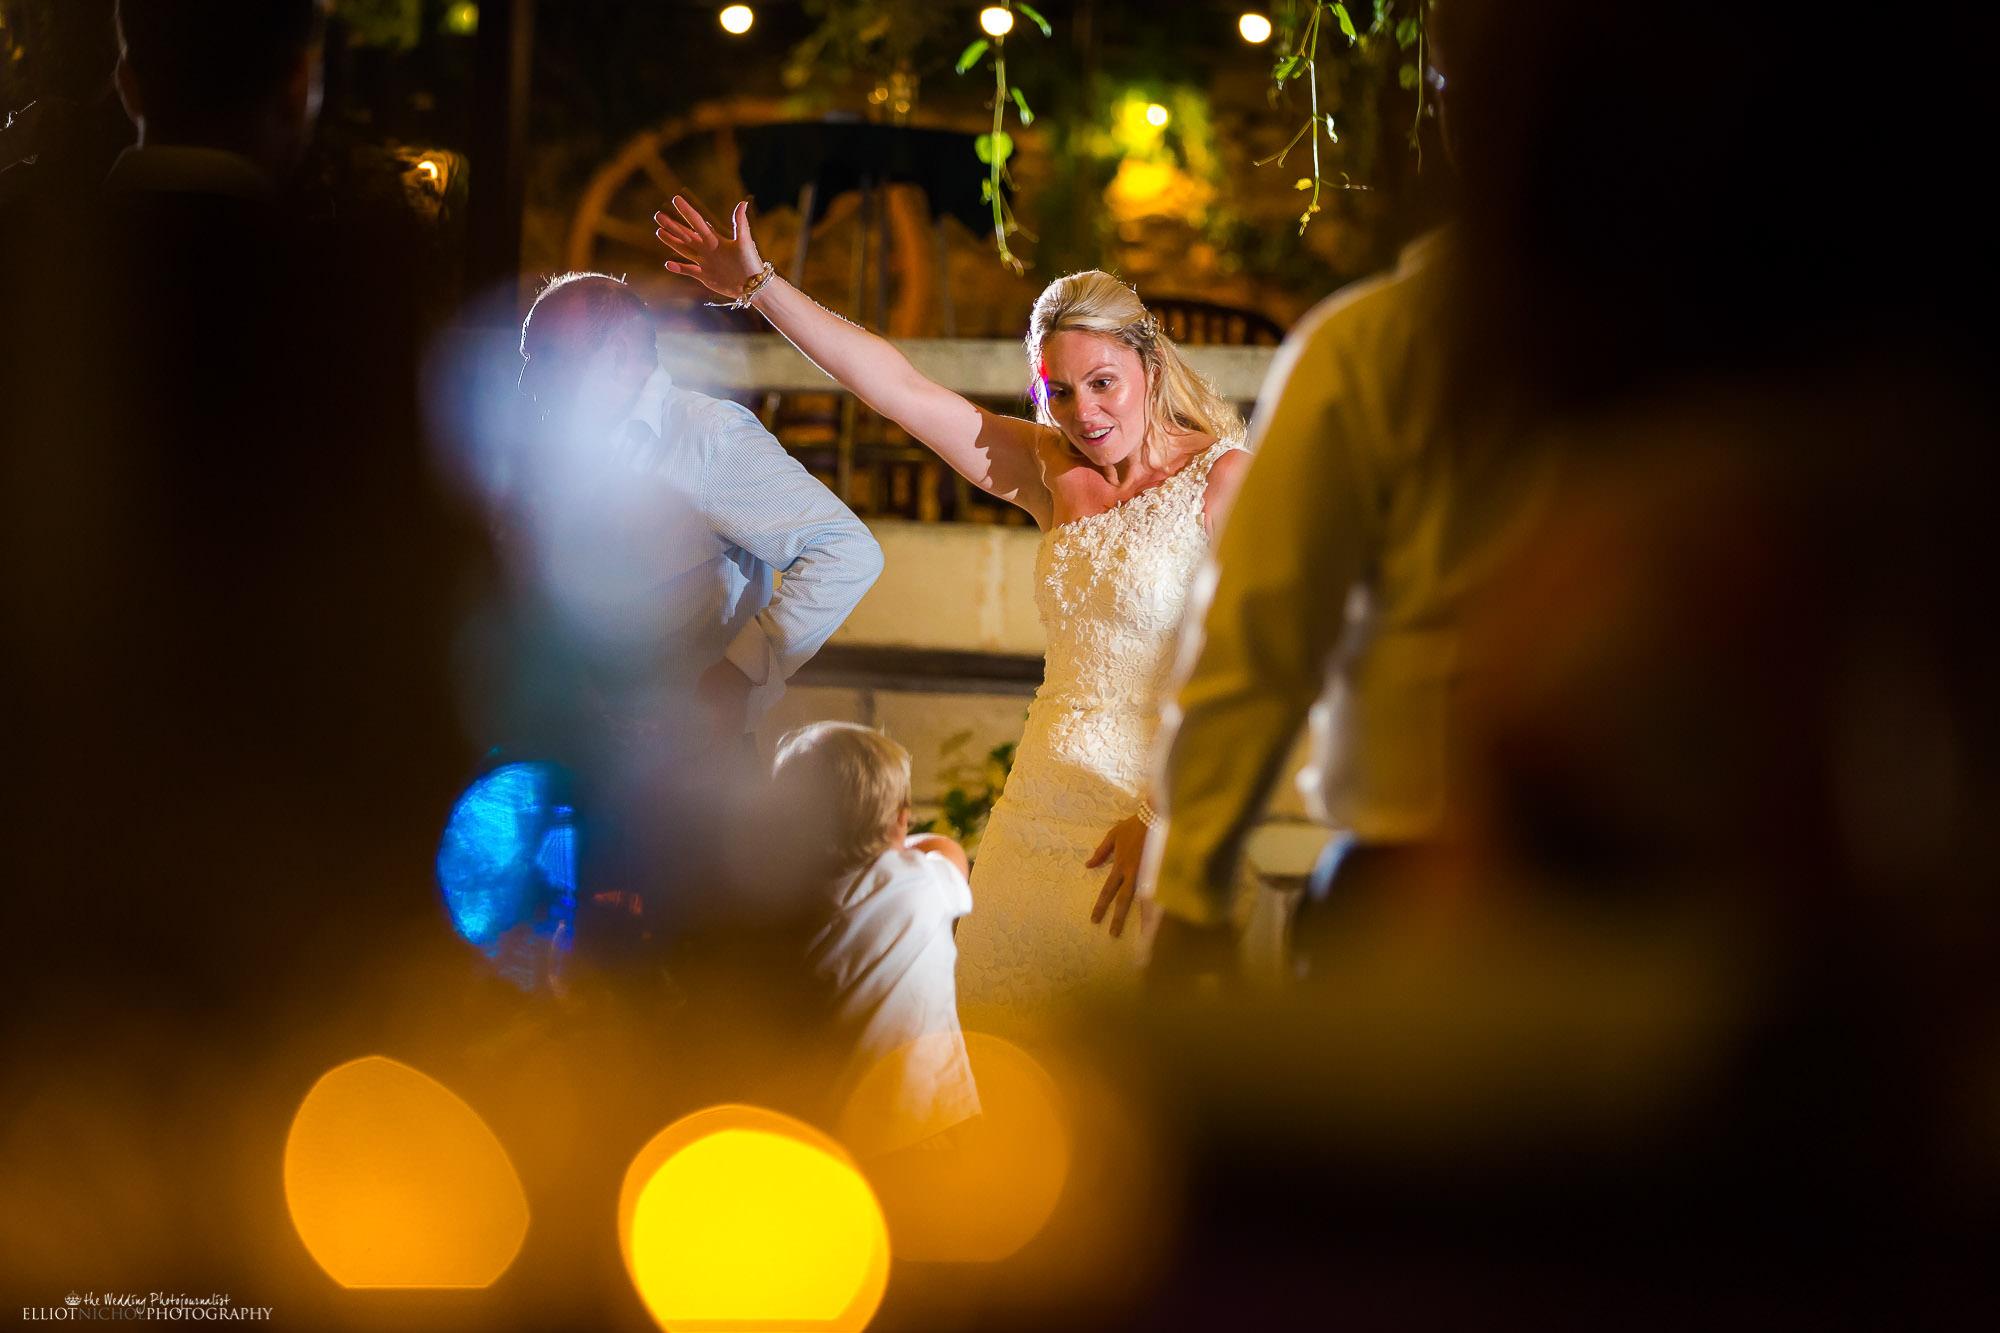 party-bride-dance-dancing-wedding-reception-photography-destination-wedding-photographer